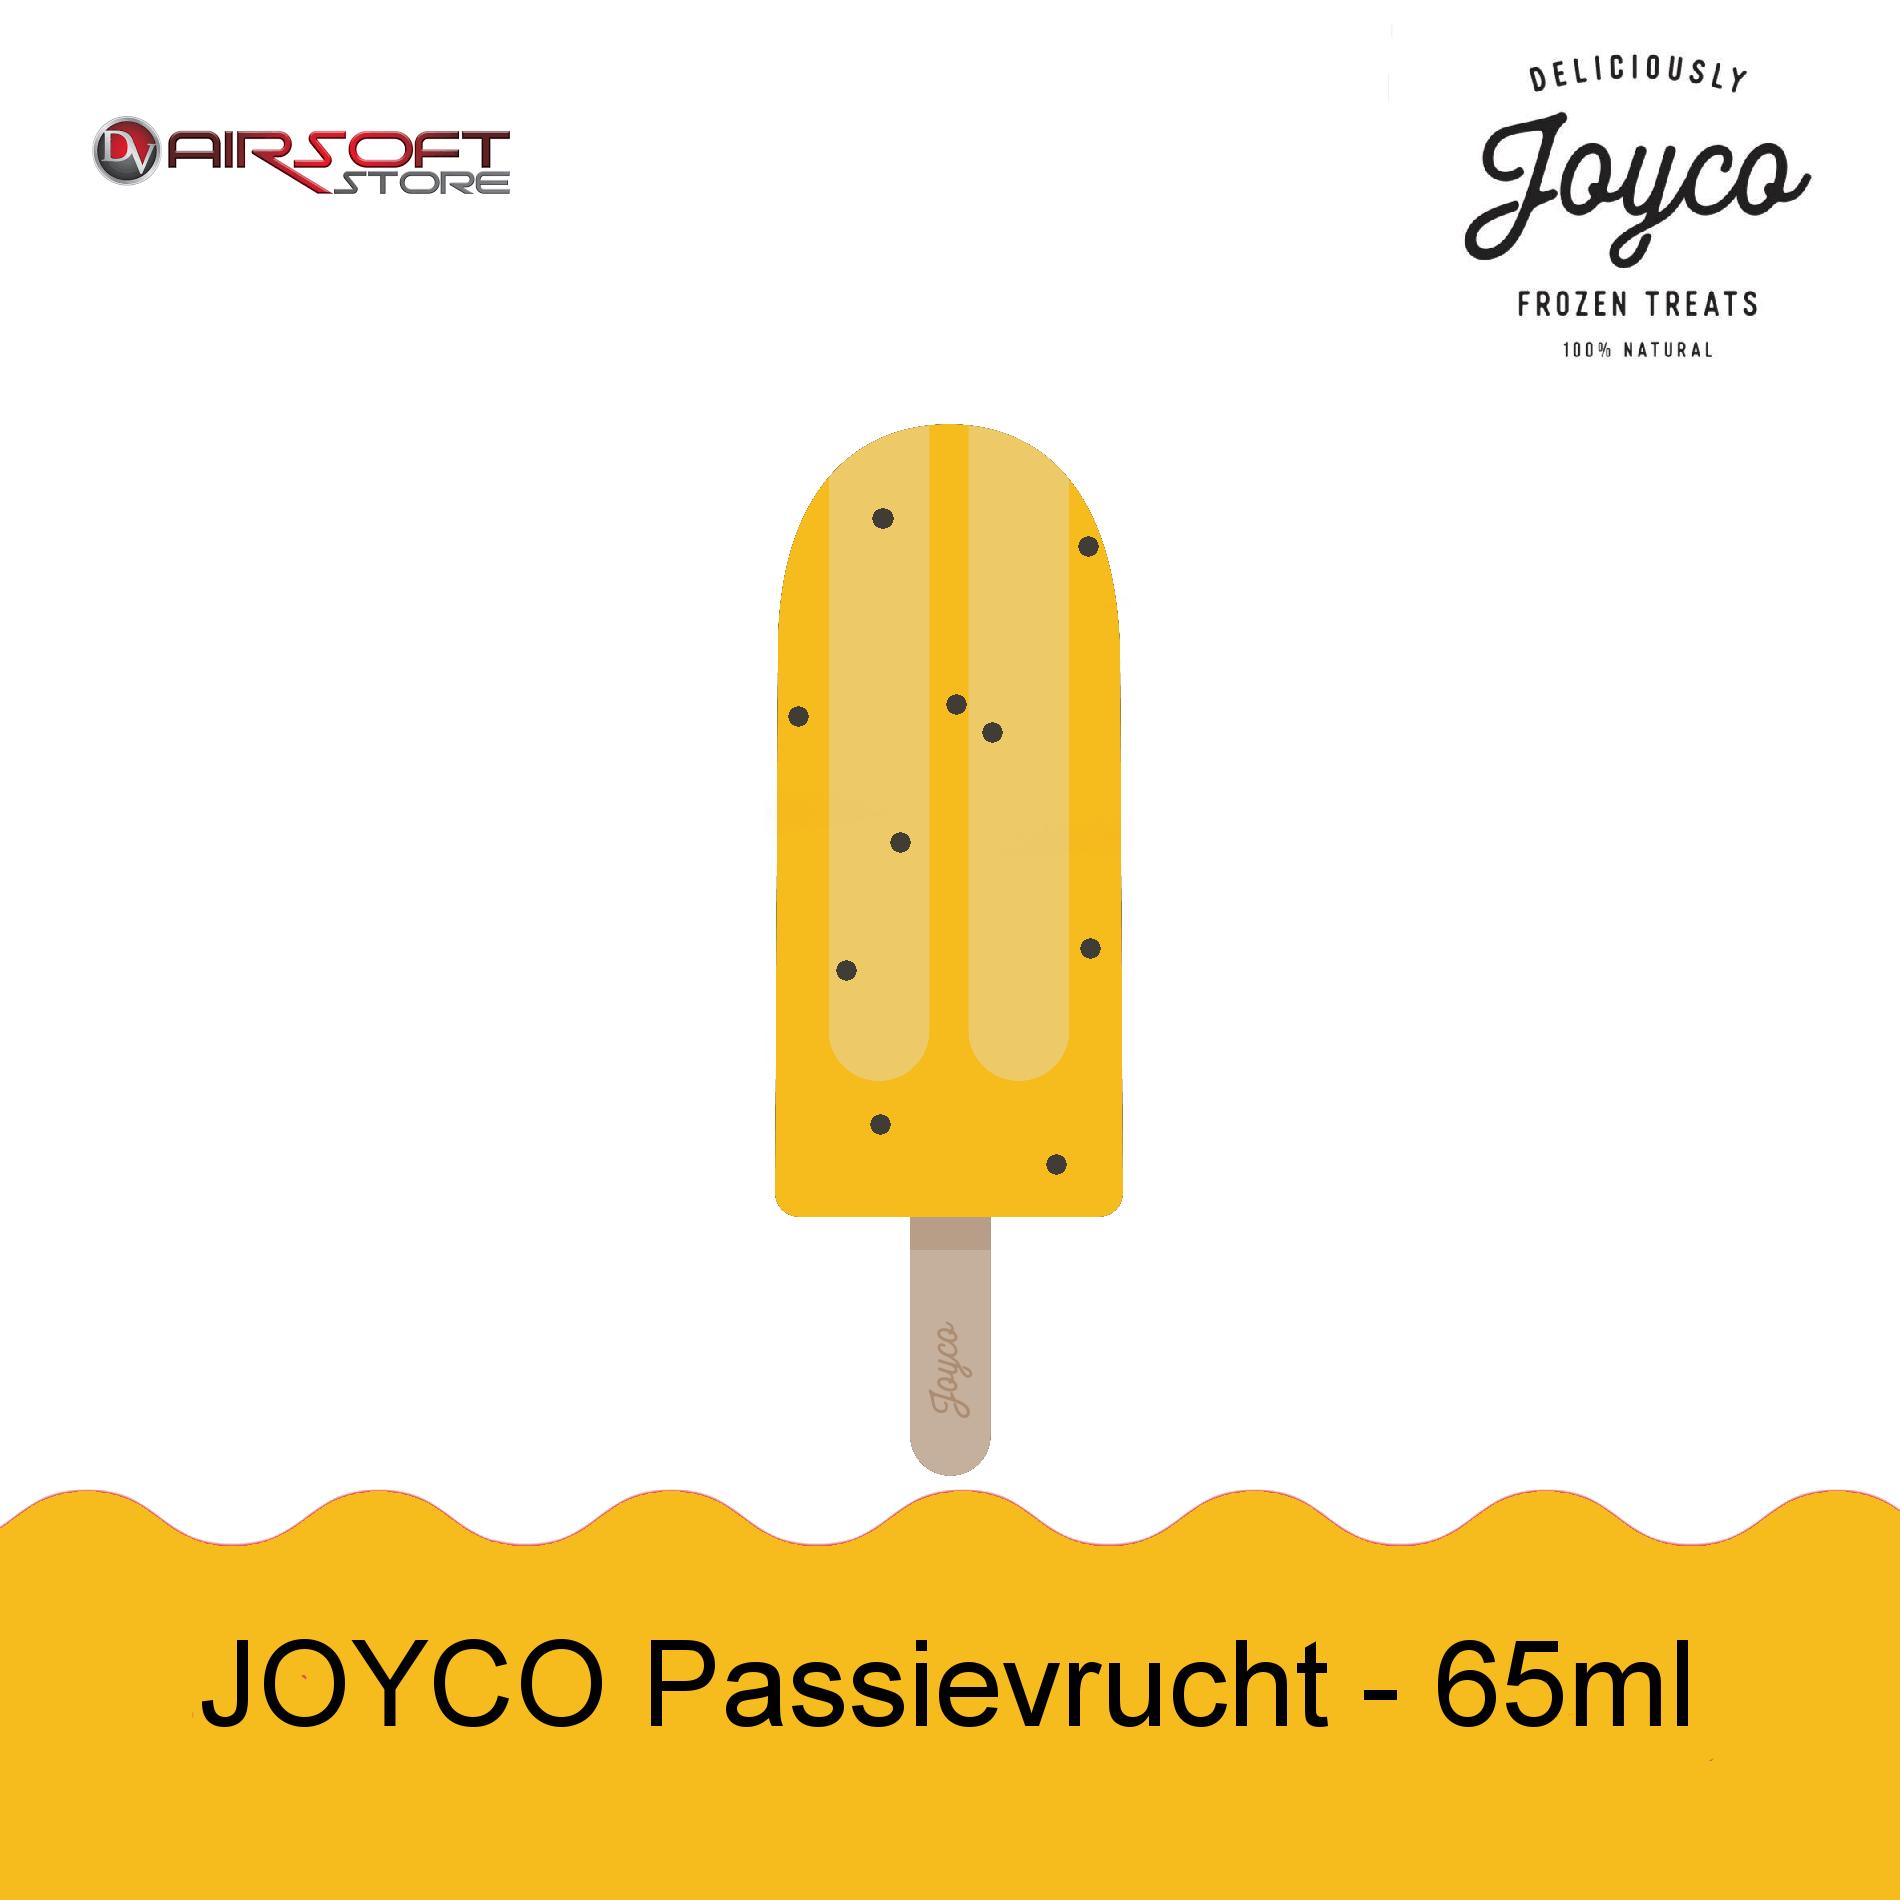 Joyco Joyco Passievrucht - 65ml